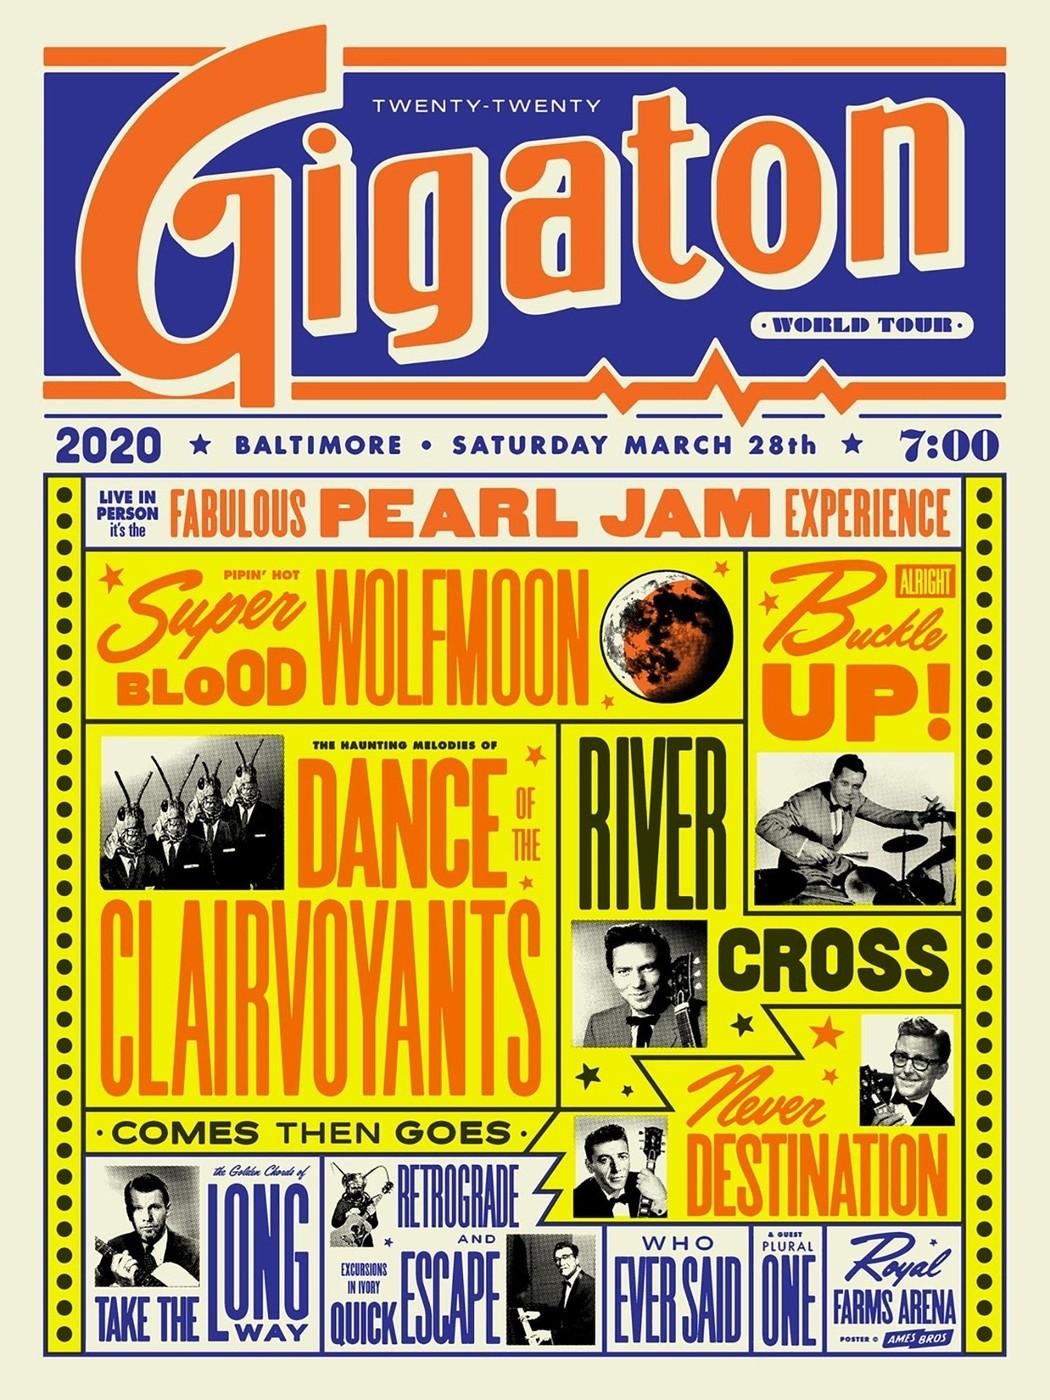 Pearl Jam Royal Farms Arena Baltimore Md 3 28 2020 Ames Bros Ap Collectionzz